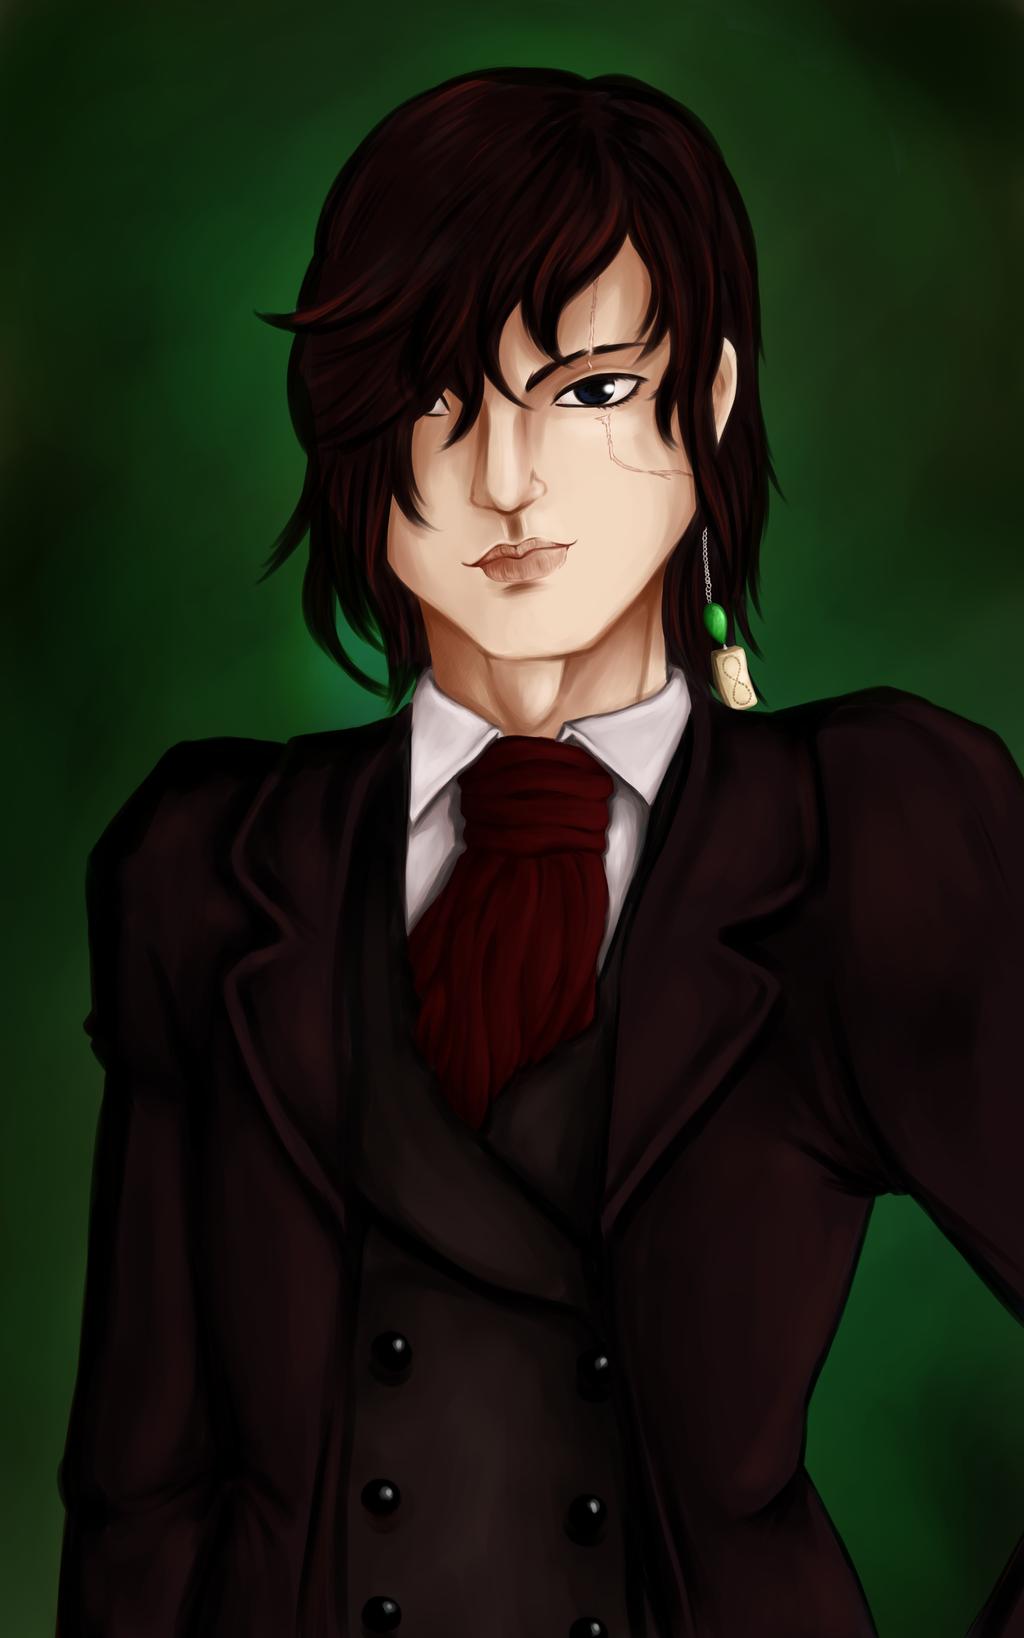 Lord Arren [contest entry] by Animefanka